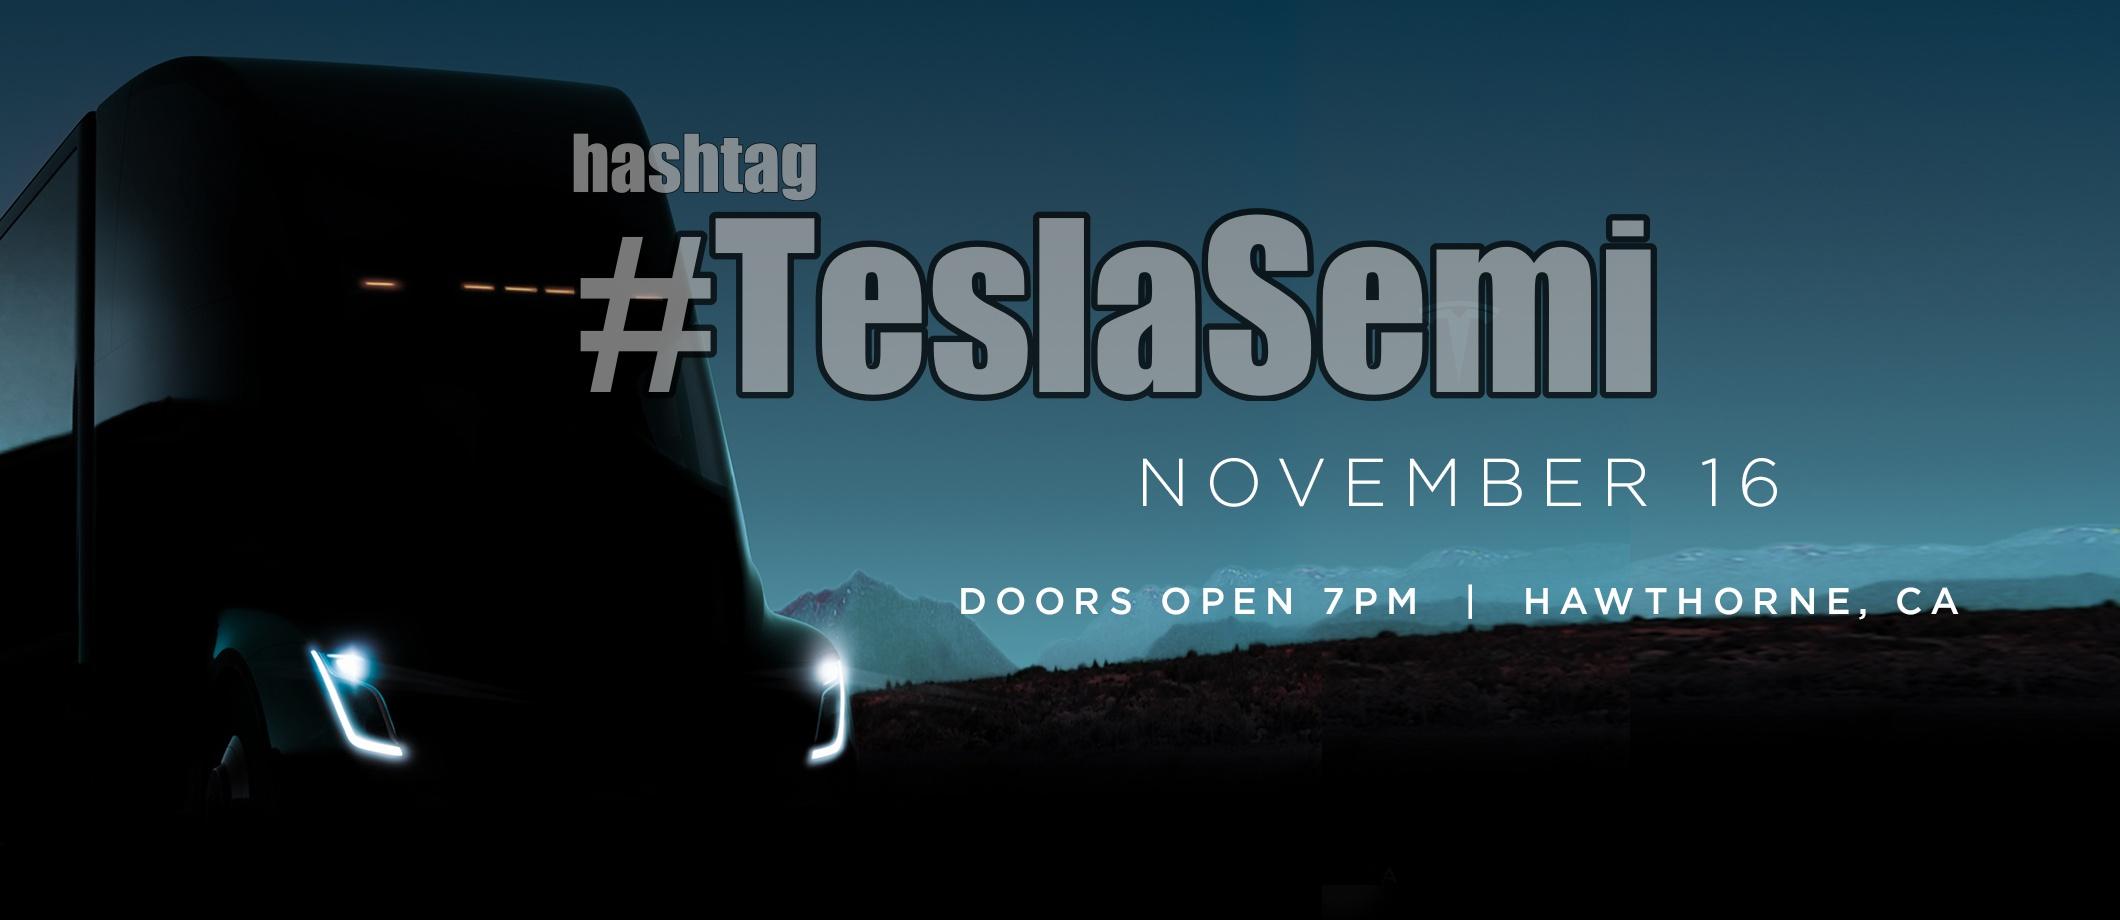 tesla-semi-hashtag-hero-2